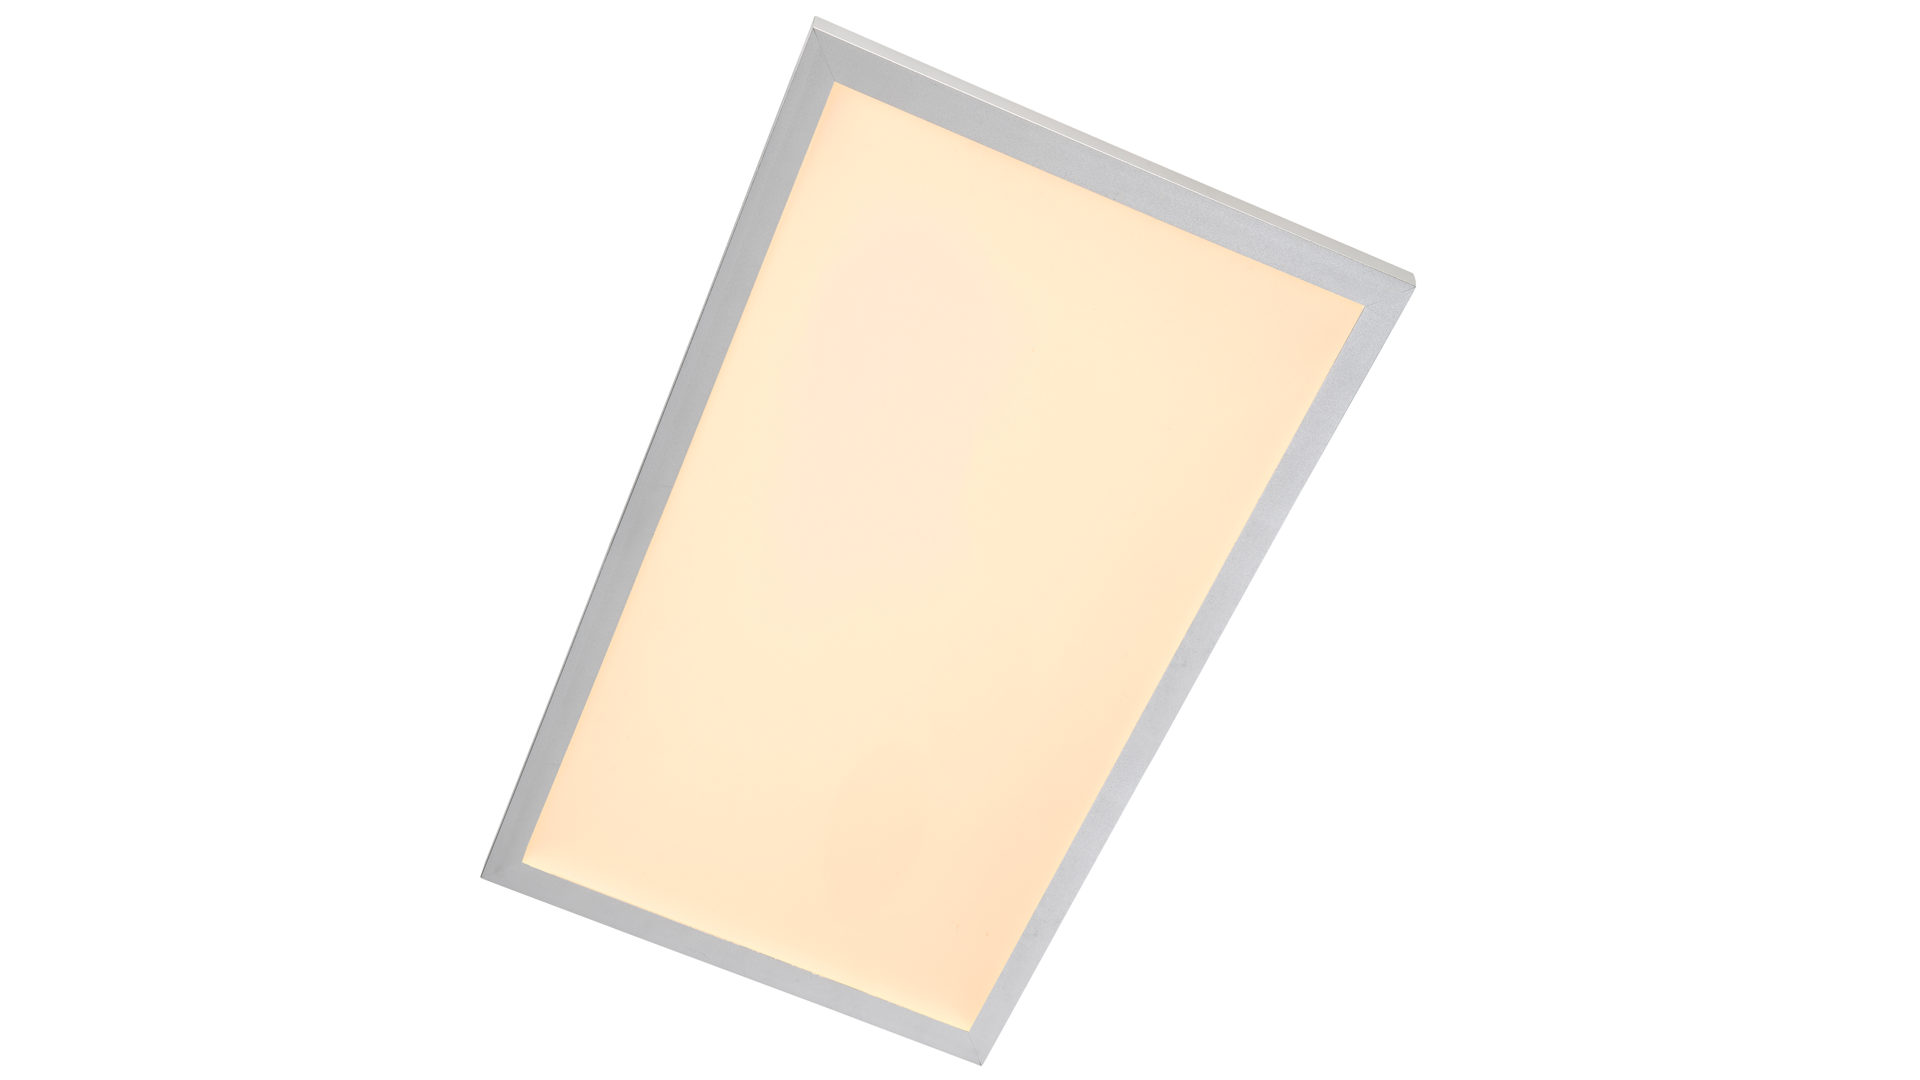 LED-Deckenleuchte Panel | titanfarb...